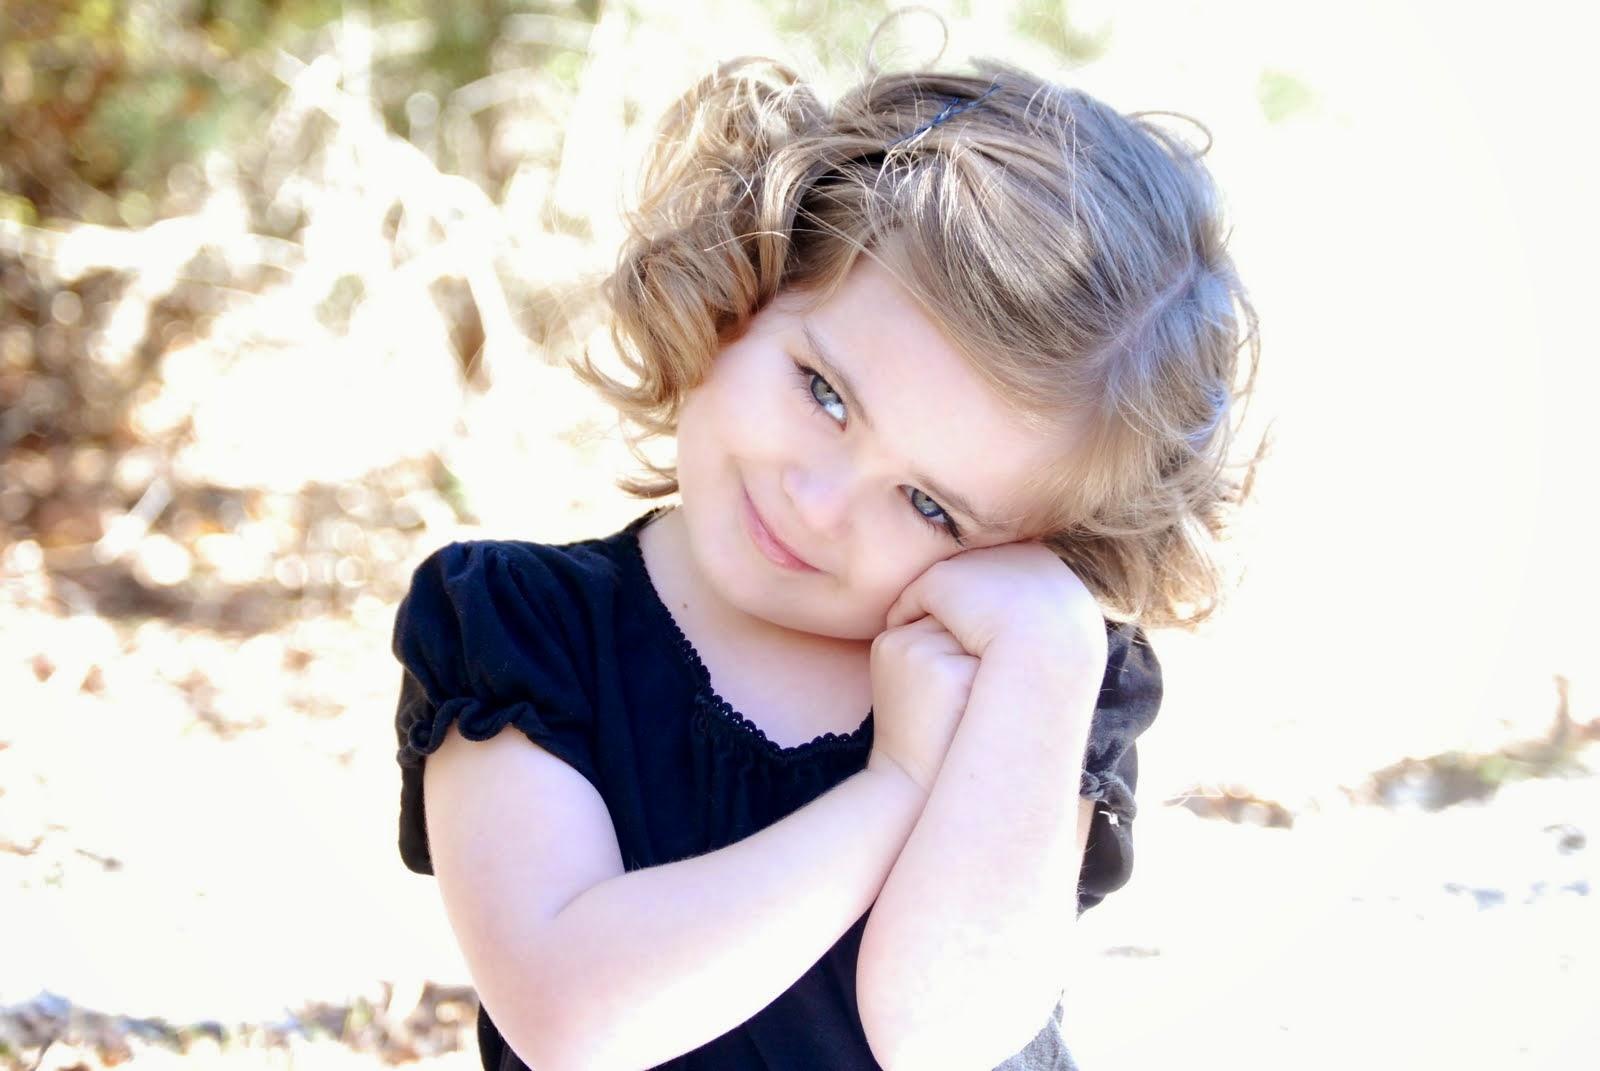 Ih Keren Dan Cantiknya Bayi Bayi Rambut Ikal Koleksi Gambar